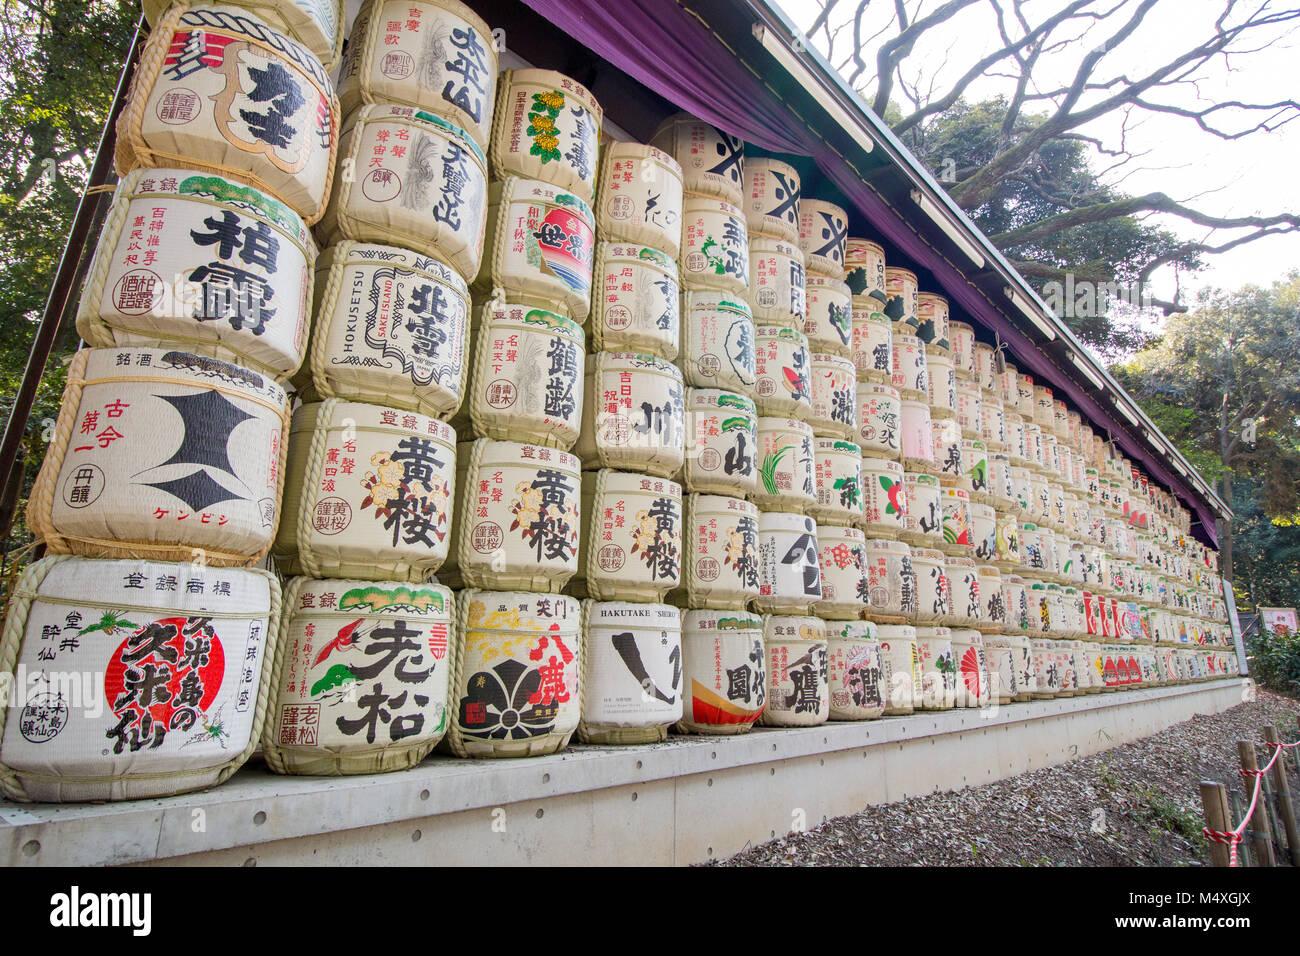 Sake barrels at the entrance to the Meiji Jingu shrine in Tokyo , Shibuya, Tokyo 151-8557, Japan - Stock Image